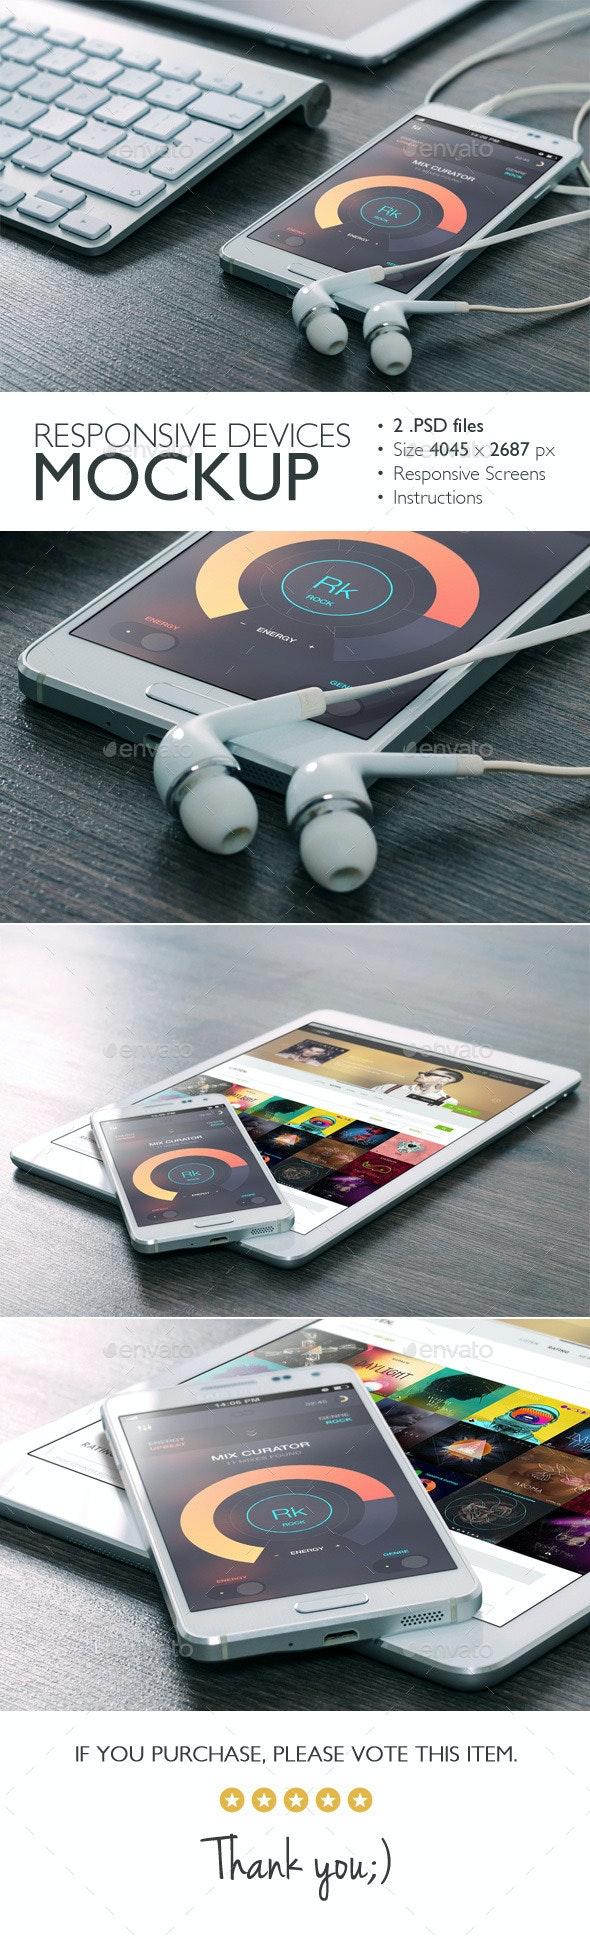 Responsive Devices Mockup v.2 - Mobile Displays